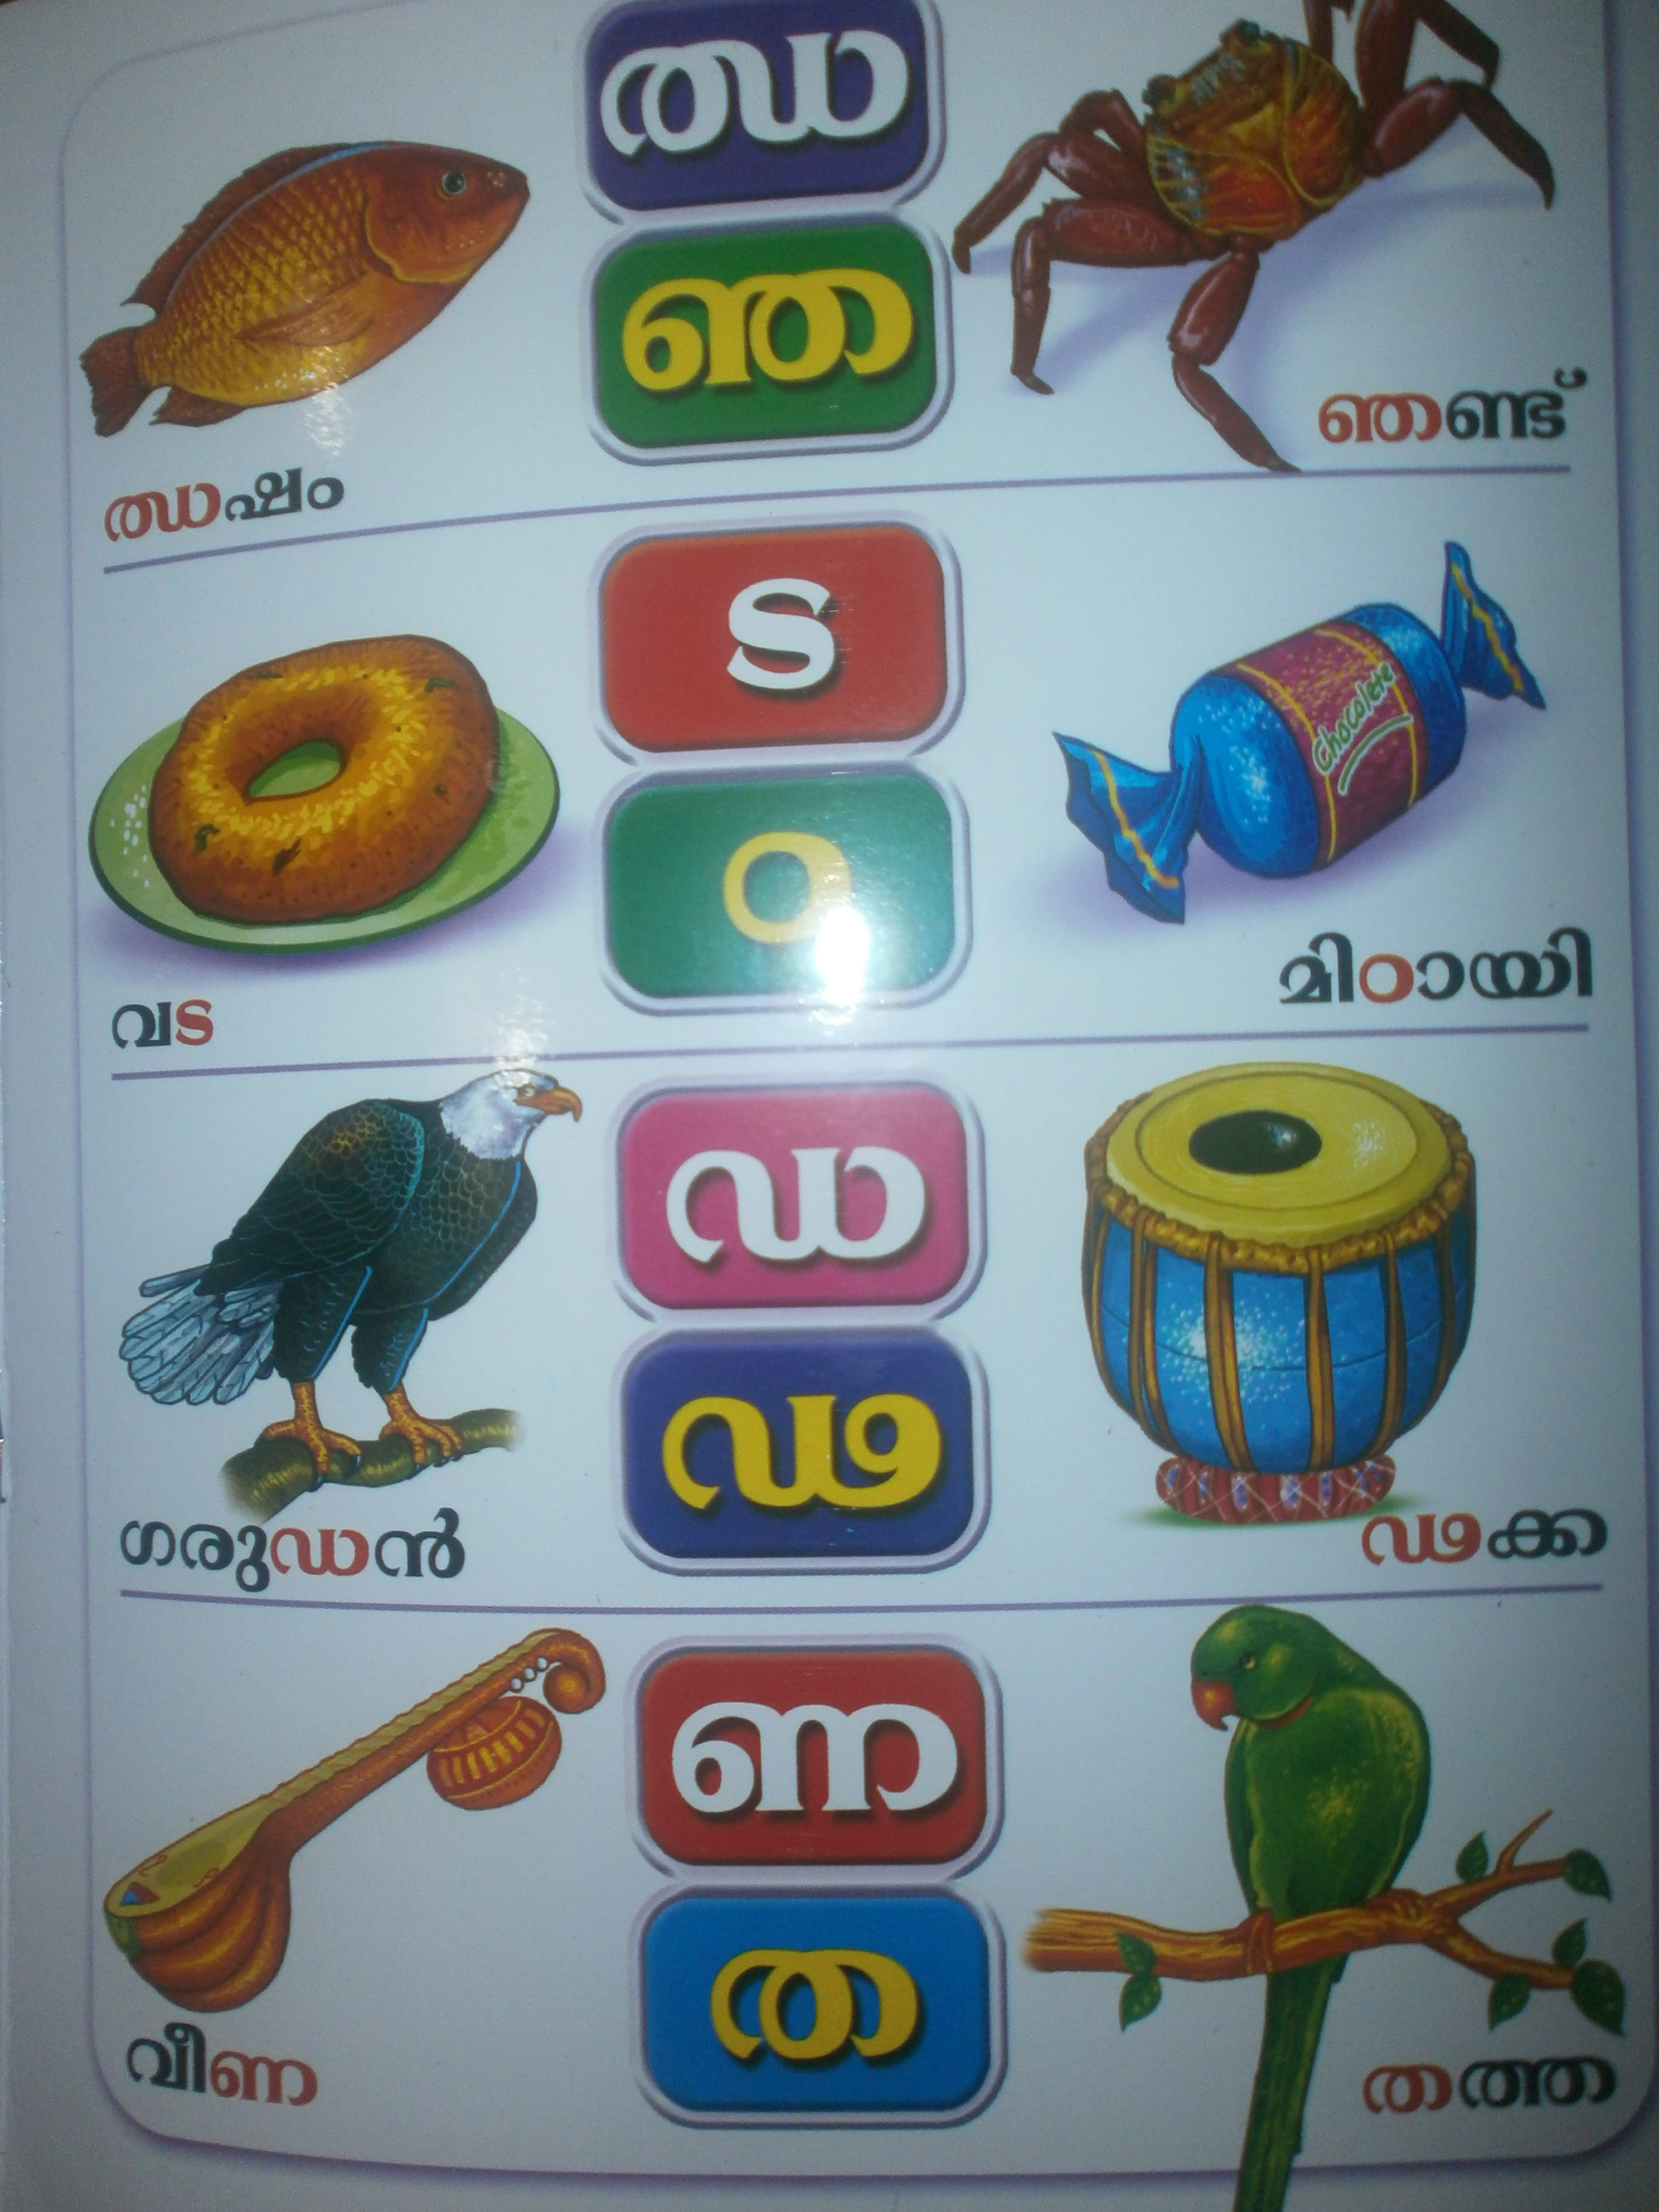 Malayalam Alphabet Words